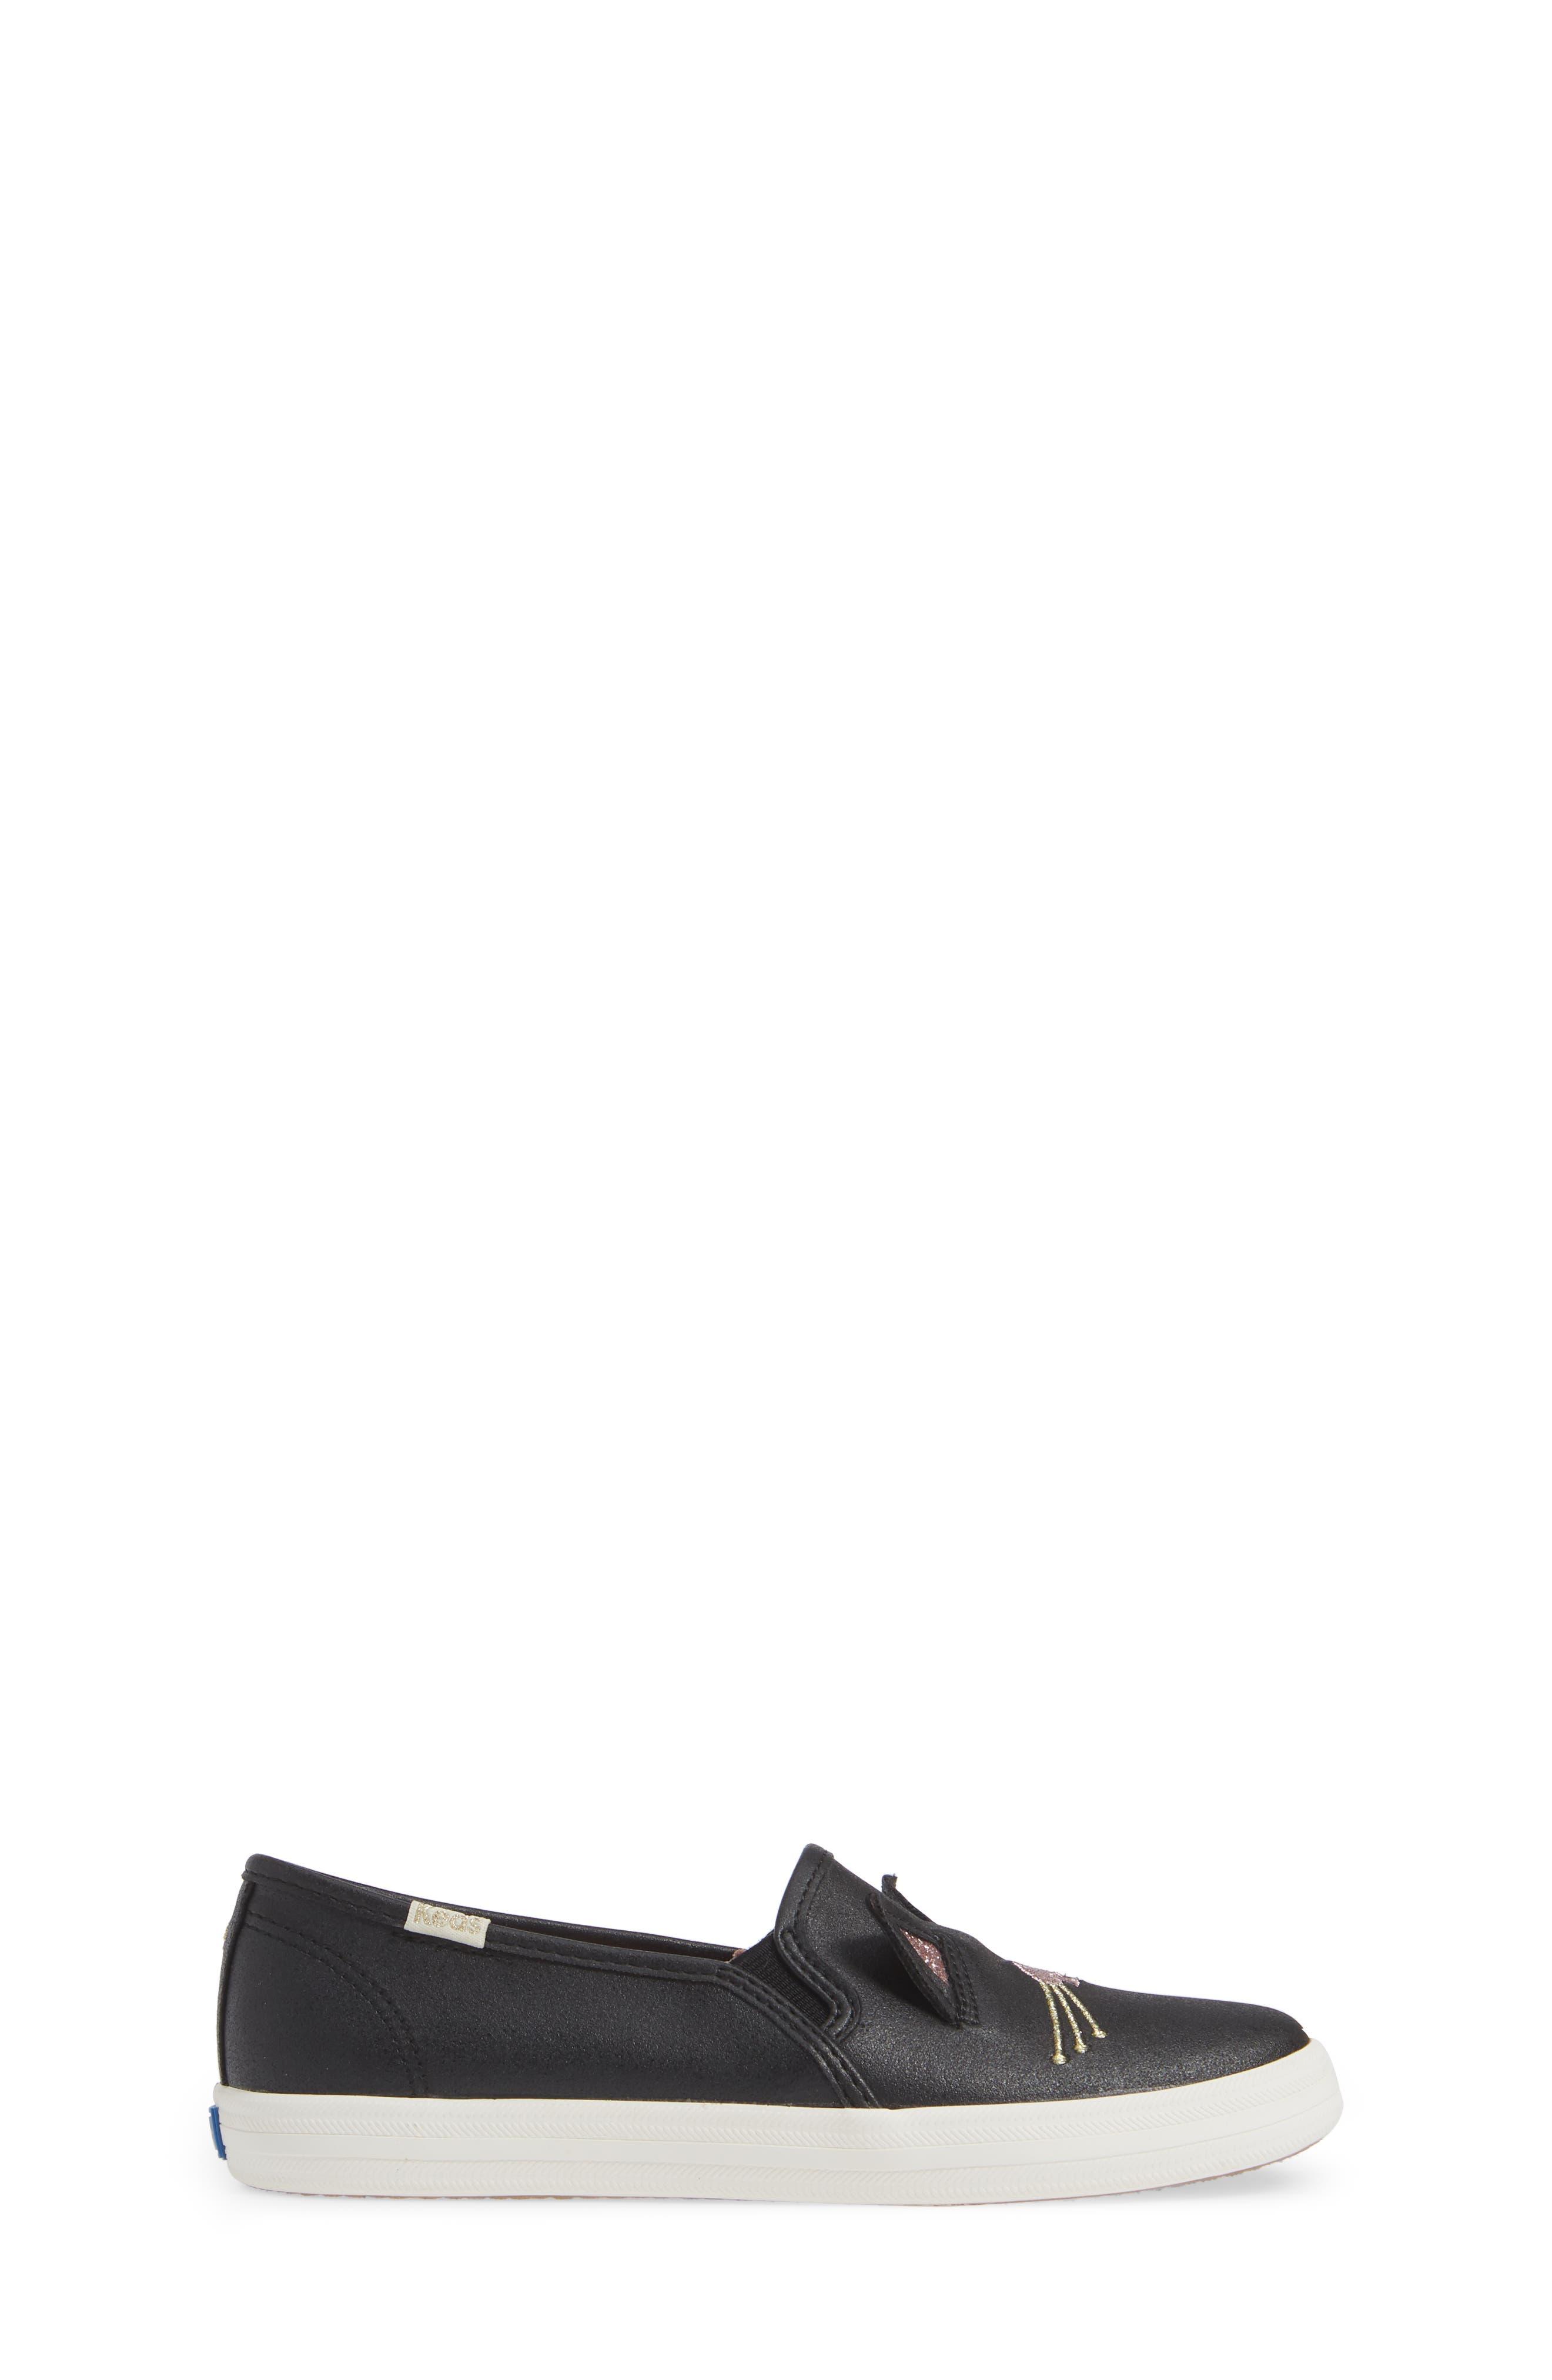 x kate spade new york Double Decker Sneaker,                             Alternate thumbnail 3, color,                             HAYDEN CAT